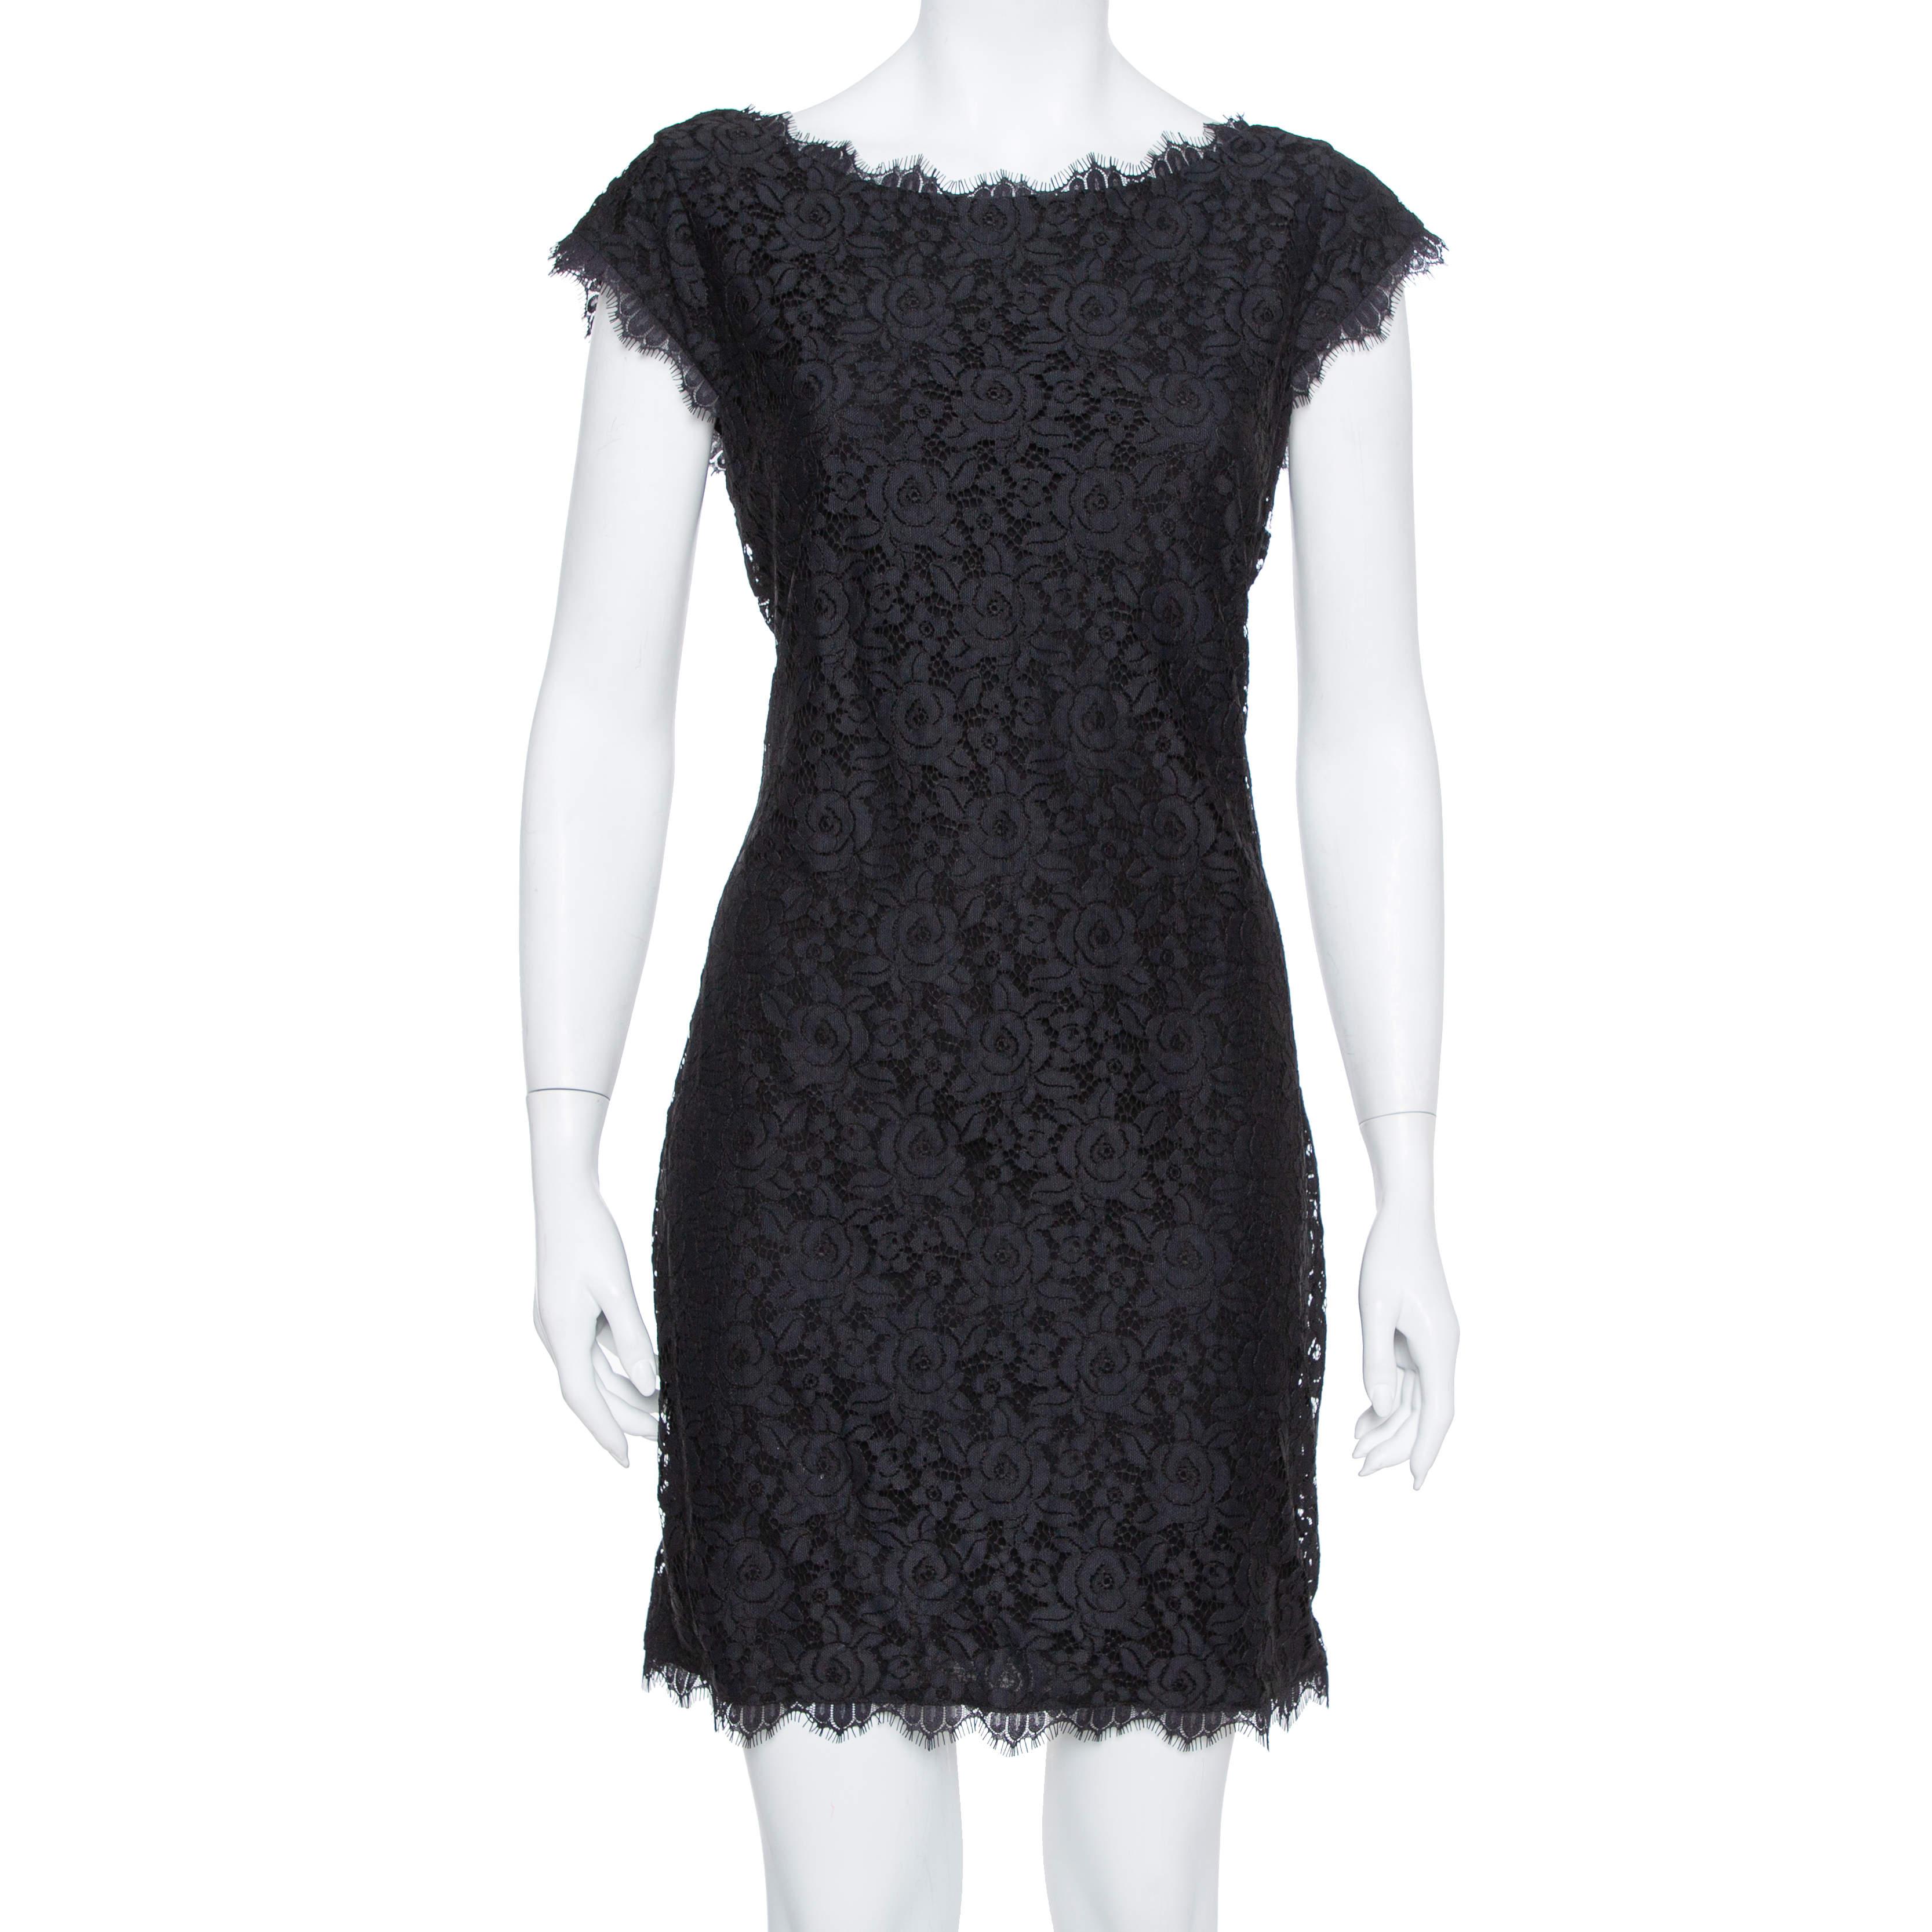 Diane Von Furstenberg Black Lace Barbara Shift Dress L